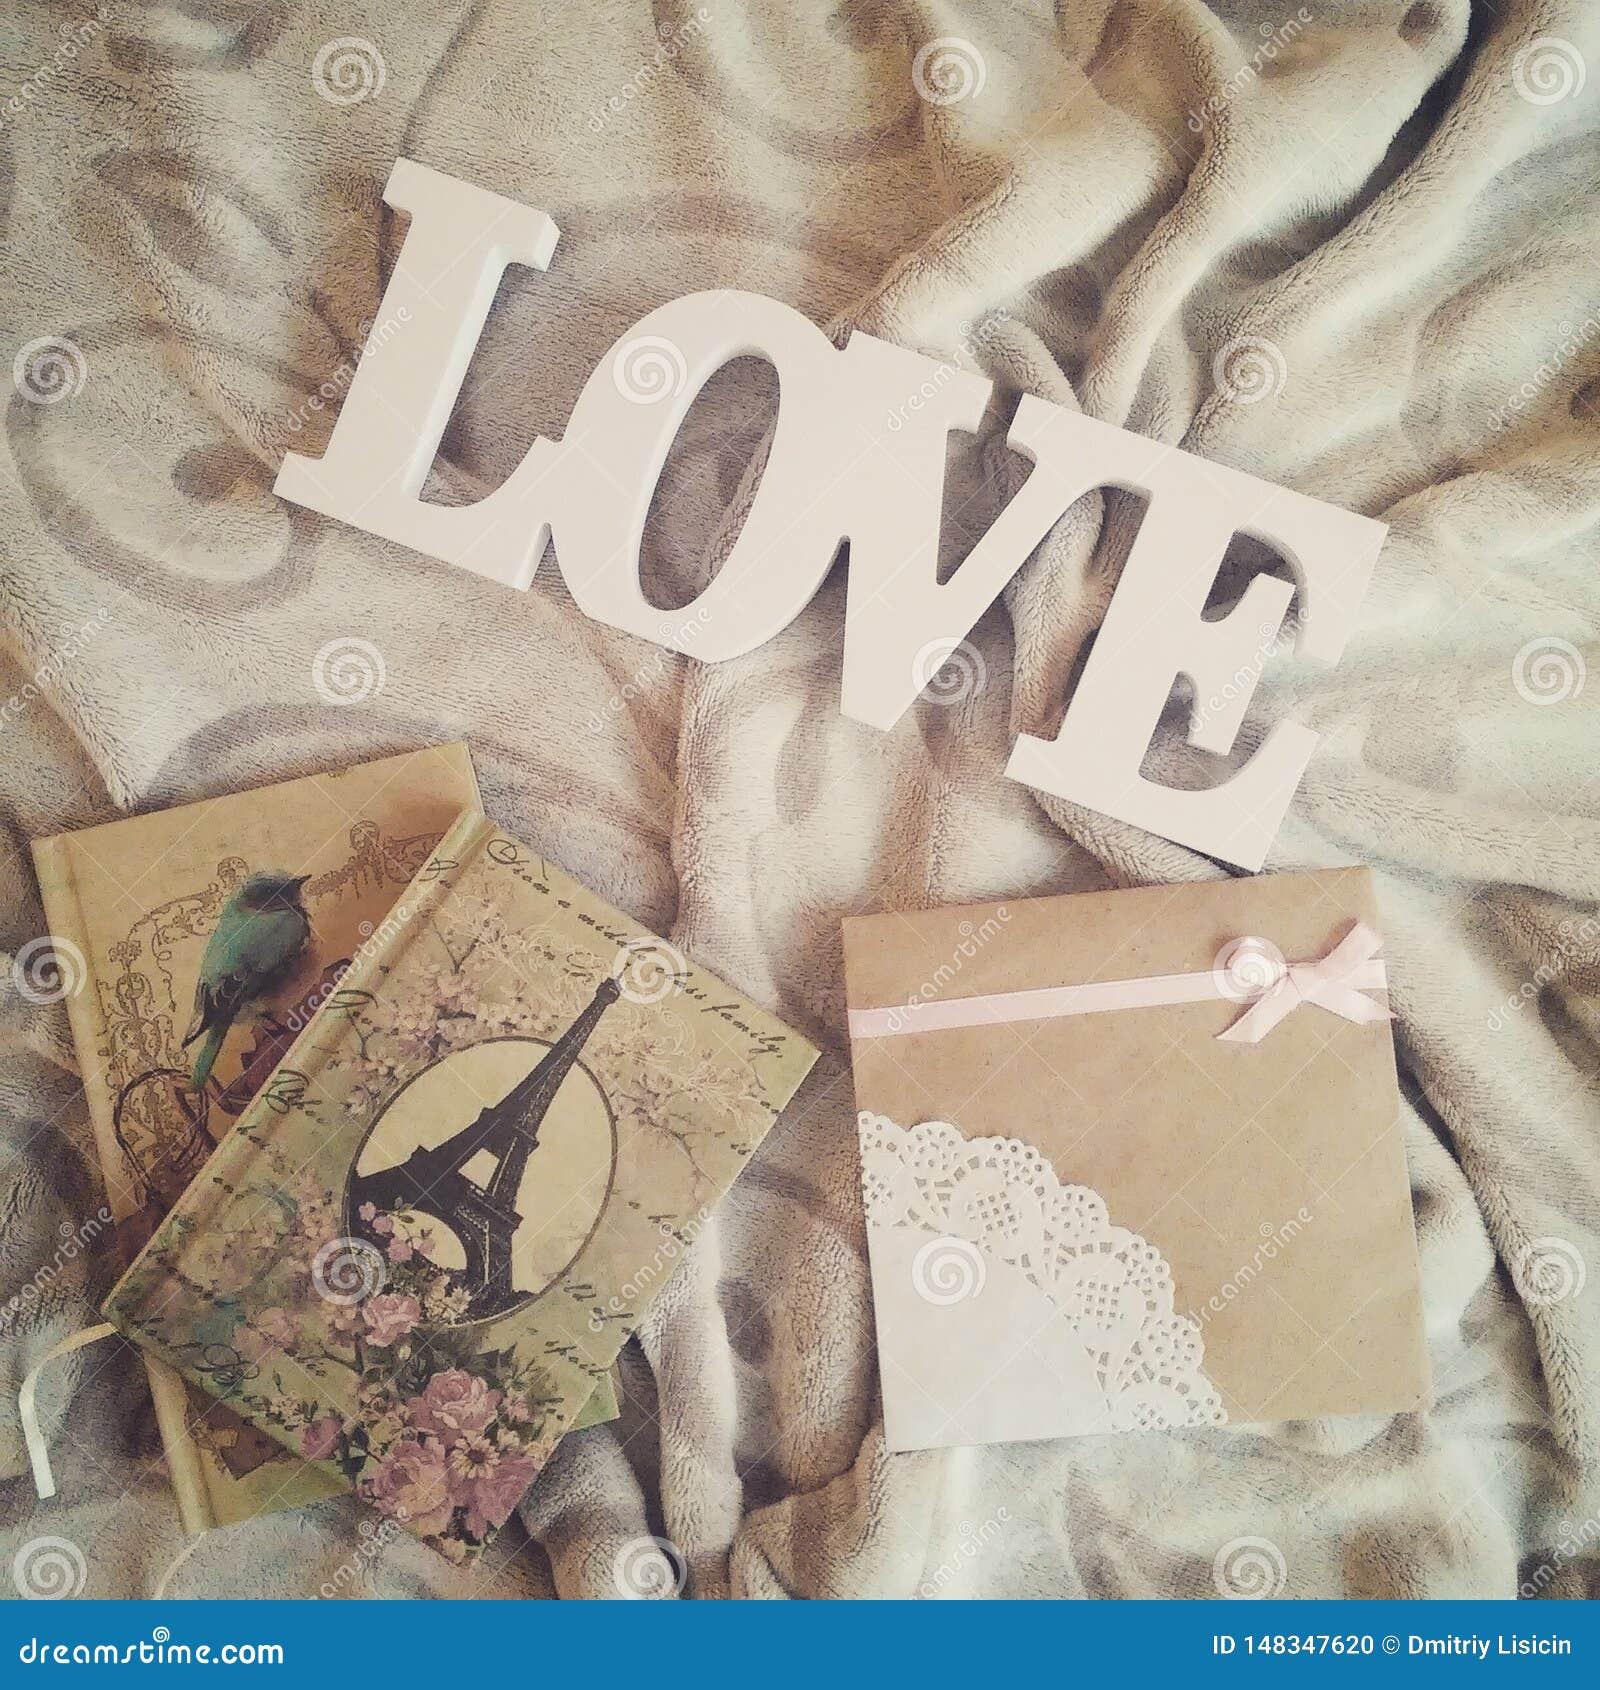 Kocham inskrypcję na pięknym tle z notatnikami